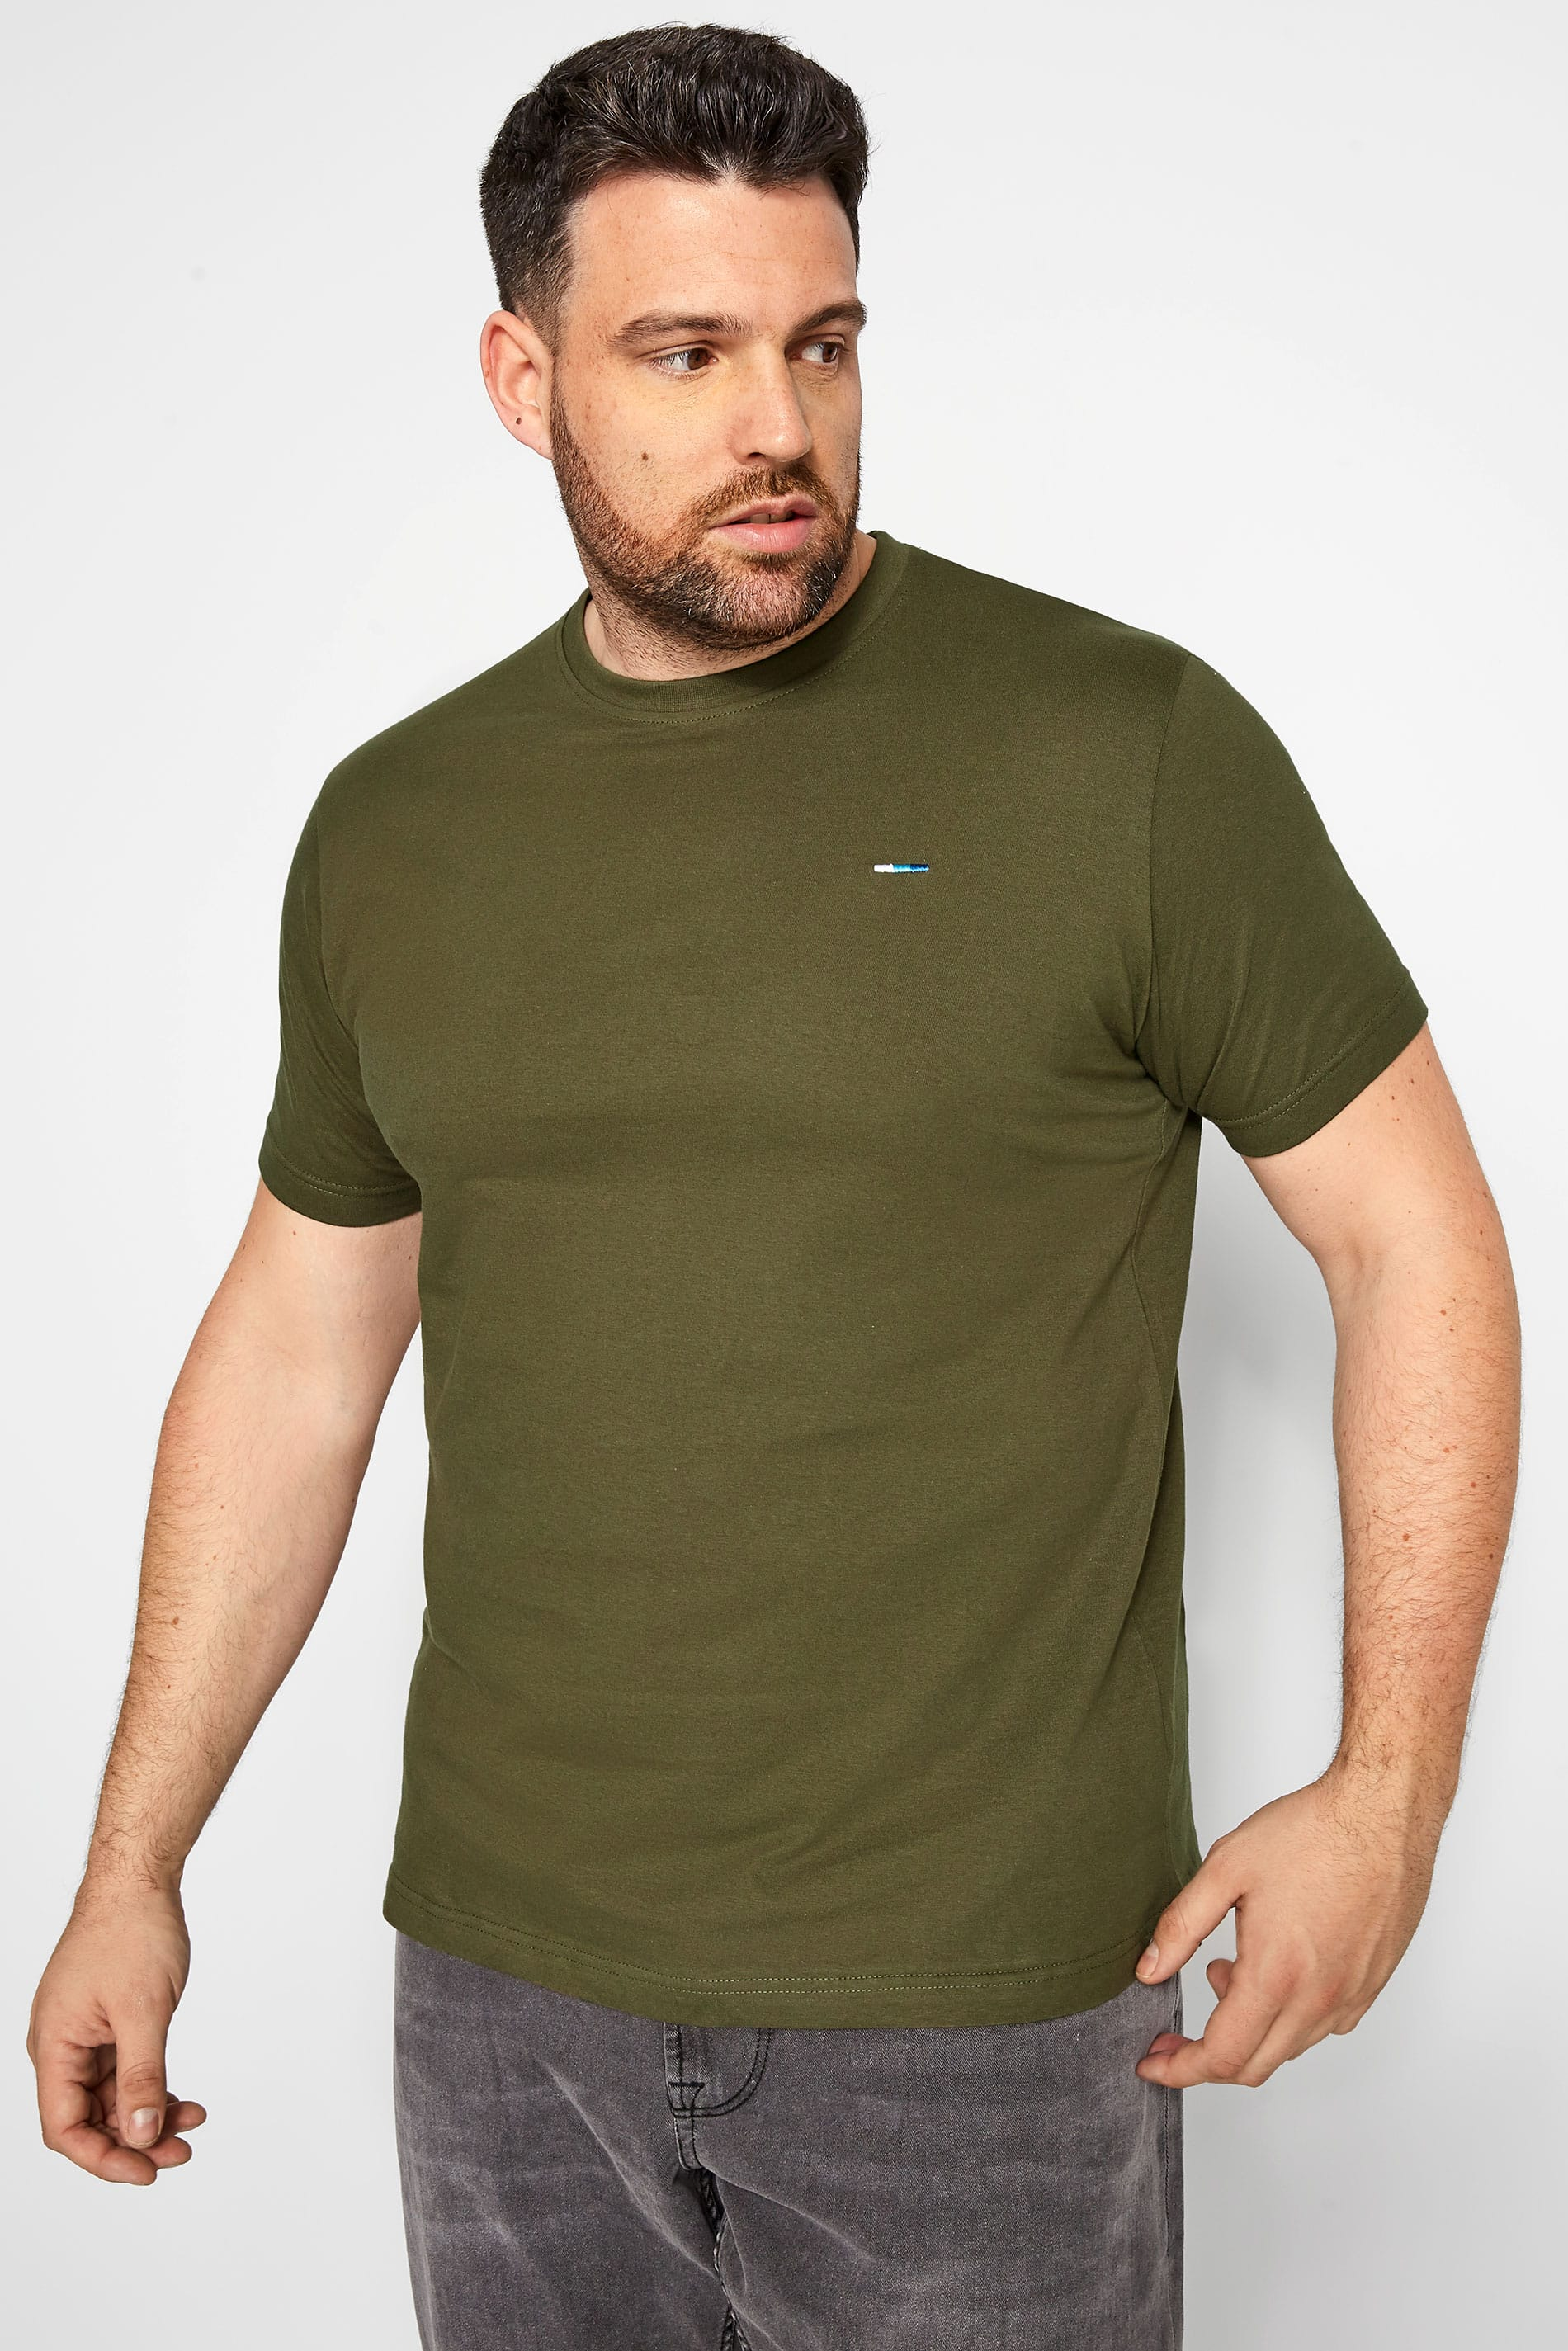 BadRhino T-Shirt mit rundem Ausschnitt - Khaki